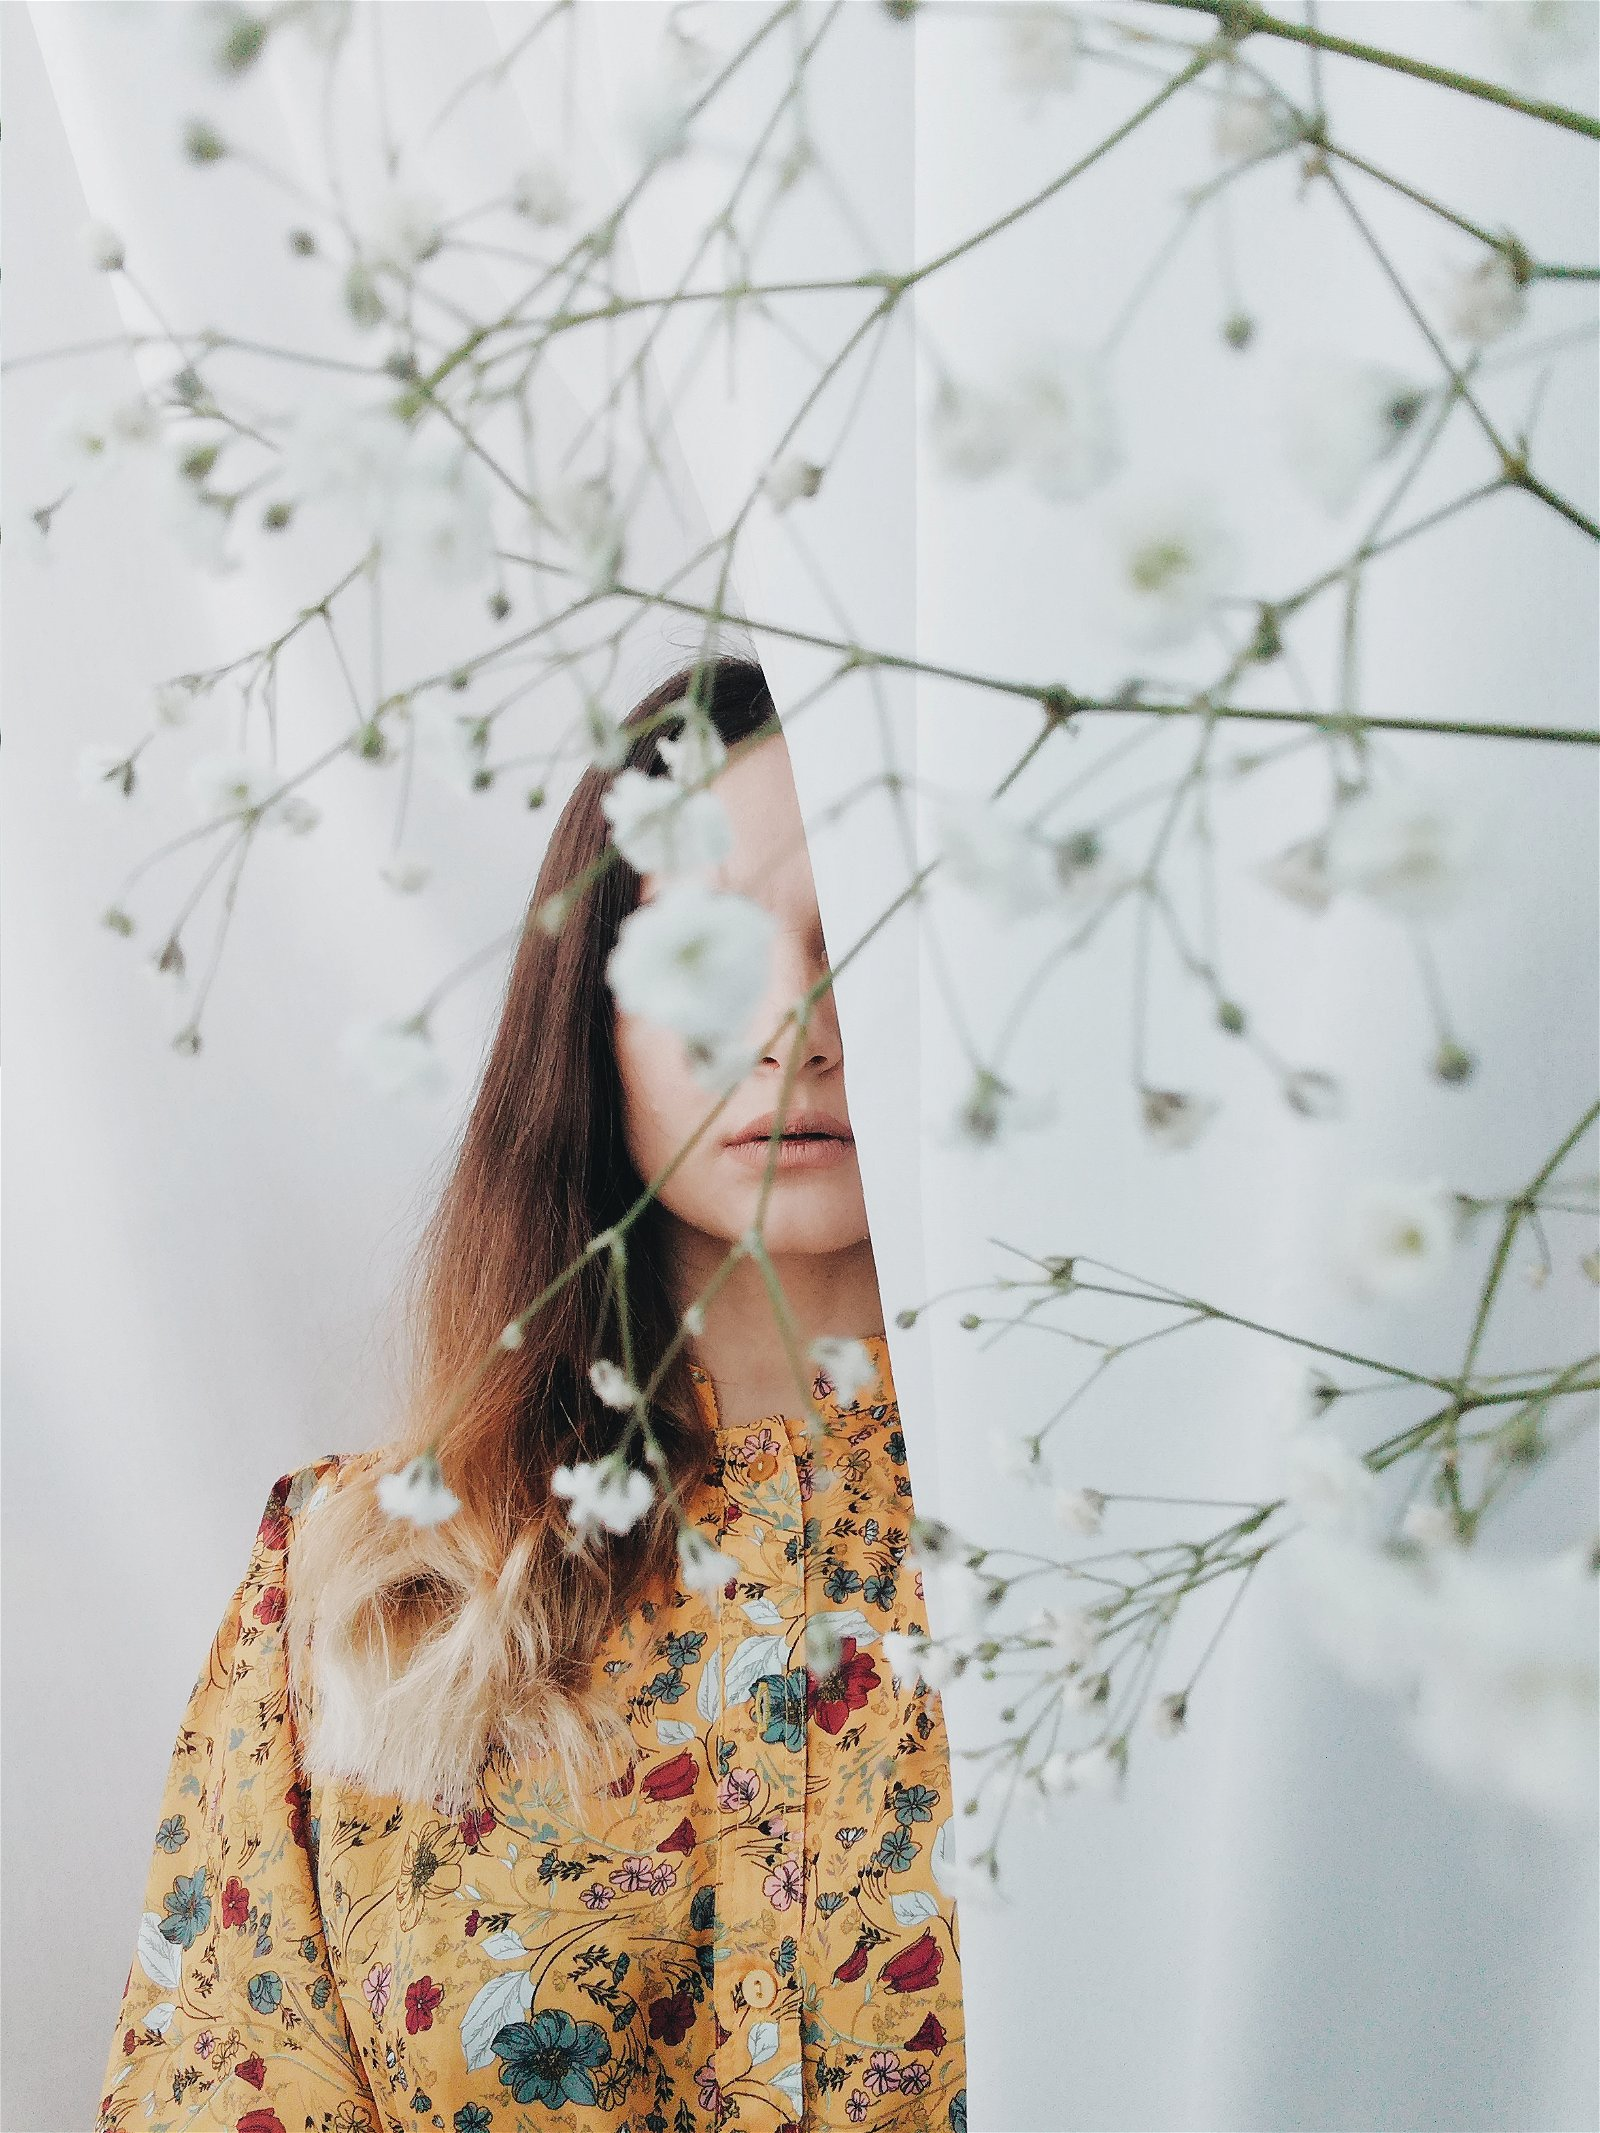 Autoportrait - Tika Jabanashvili - Cherrydeck